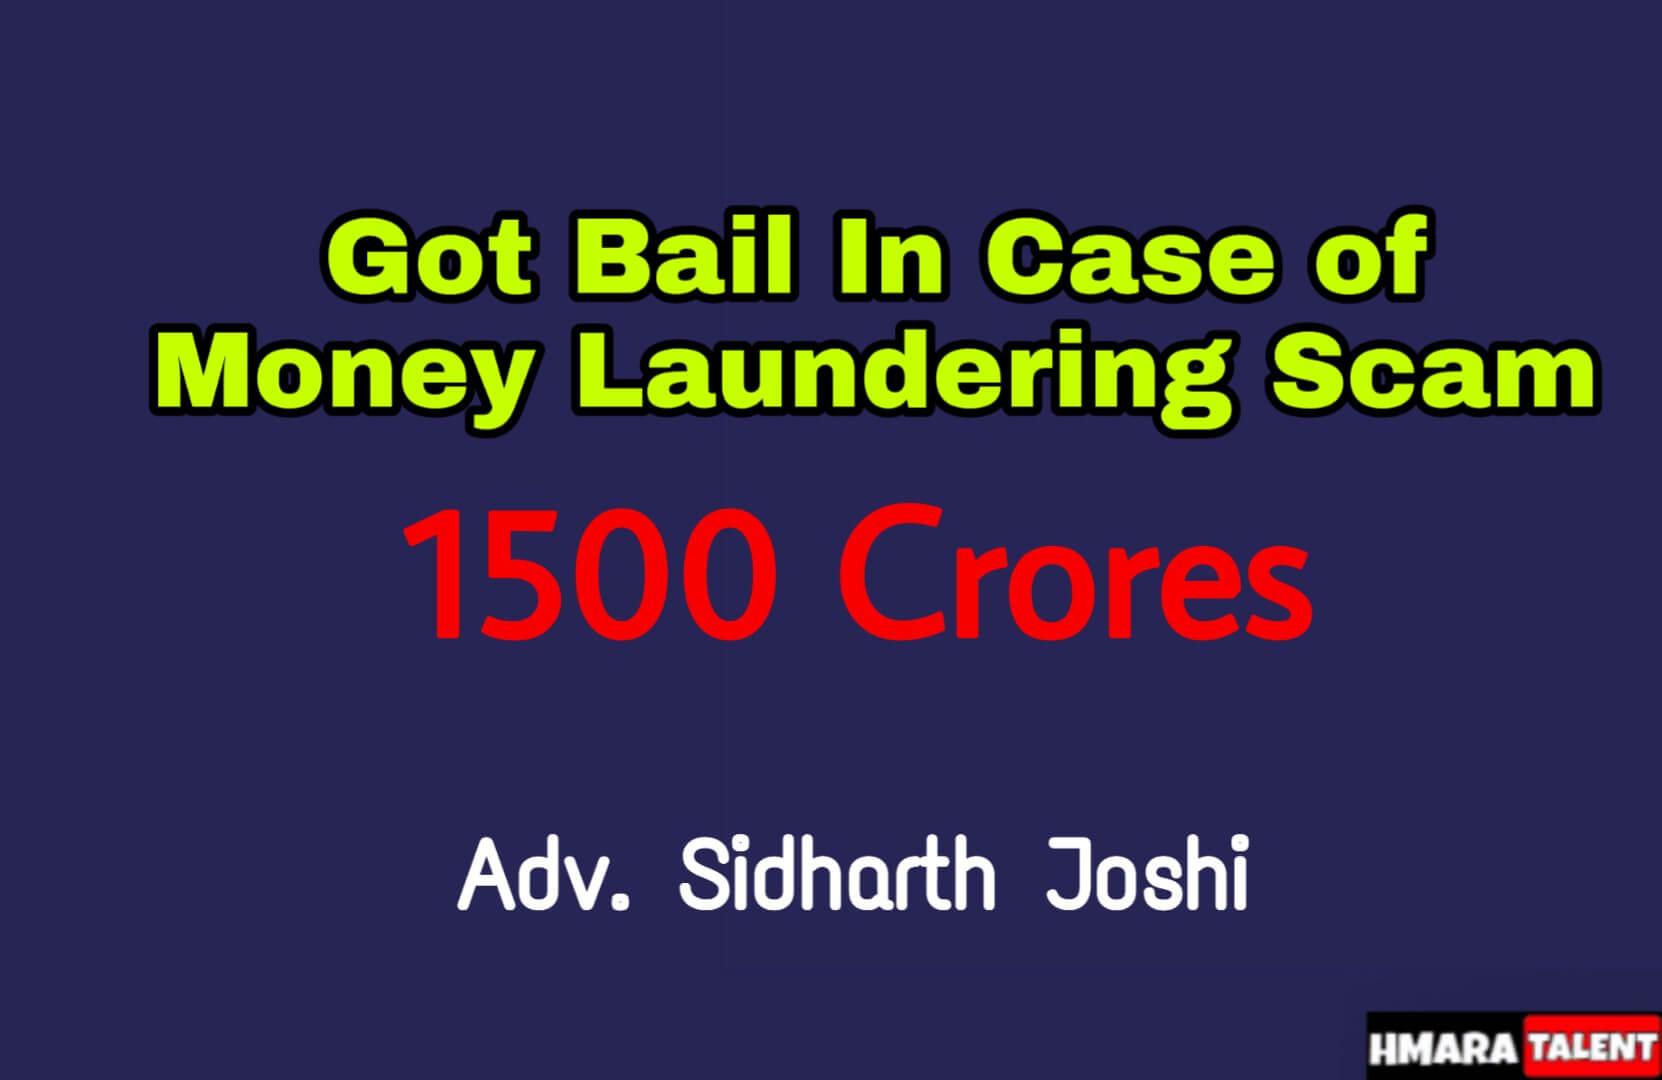 Andhra Pradesh High Court Granted Regular Bail In Rs. 1,500 Crores Case of ED